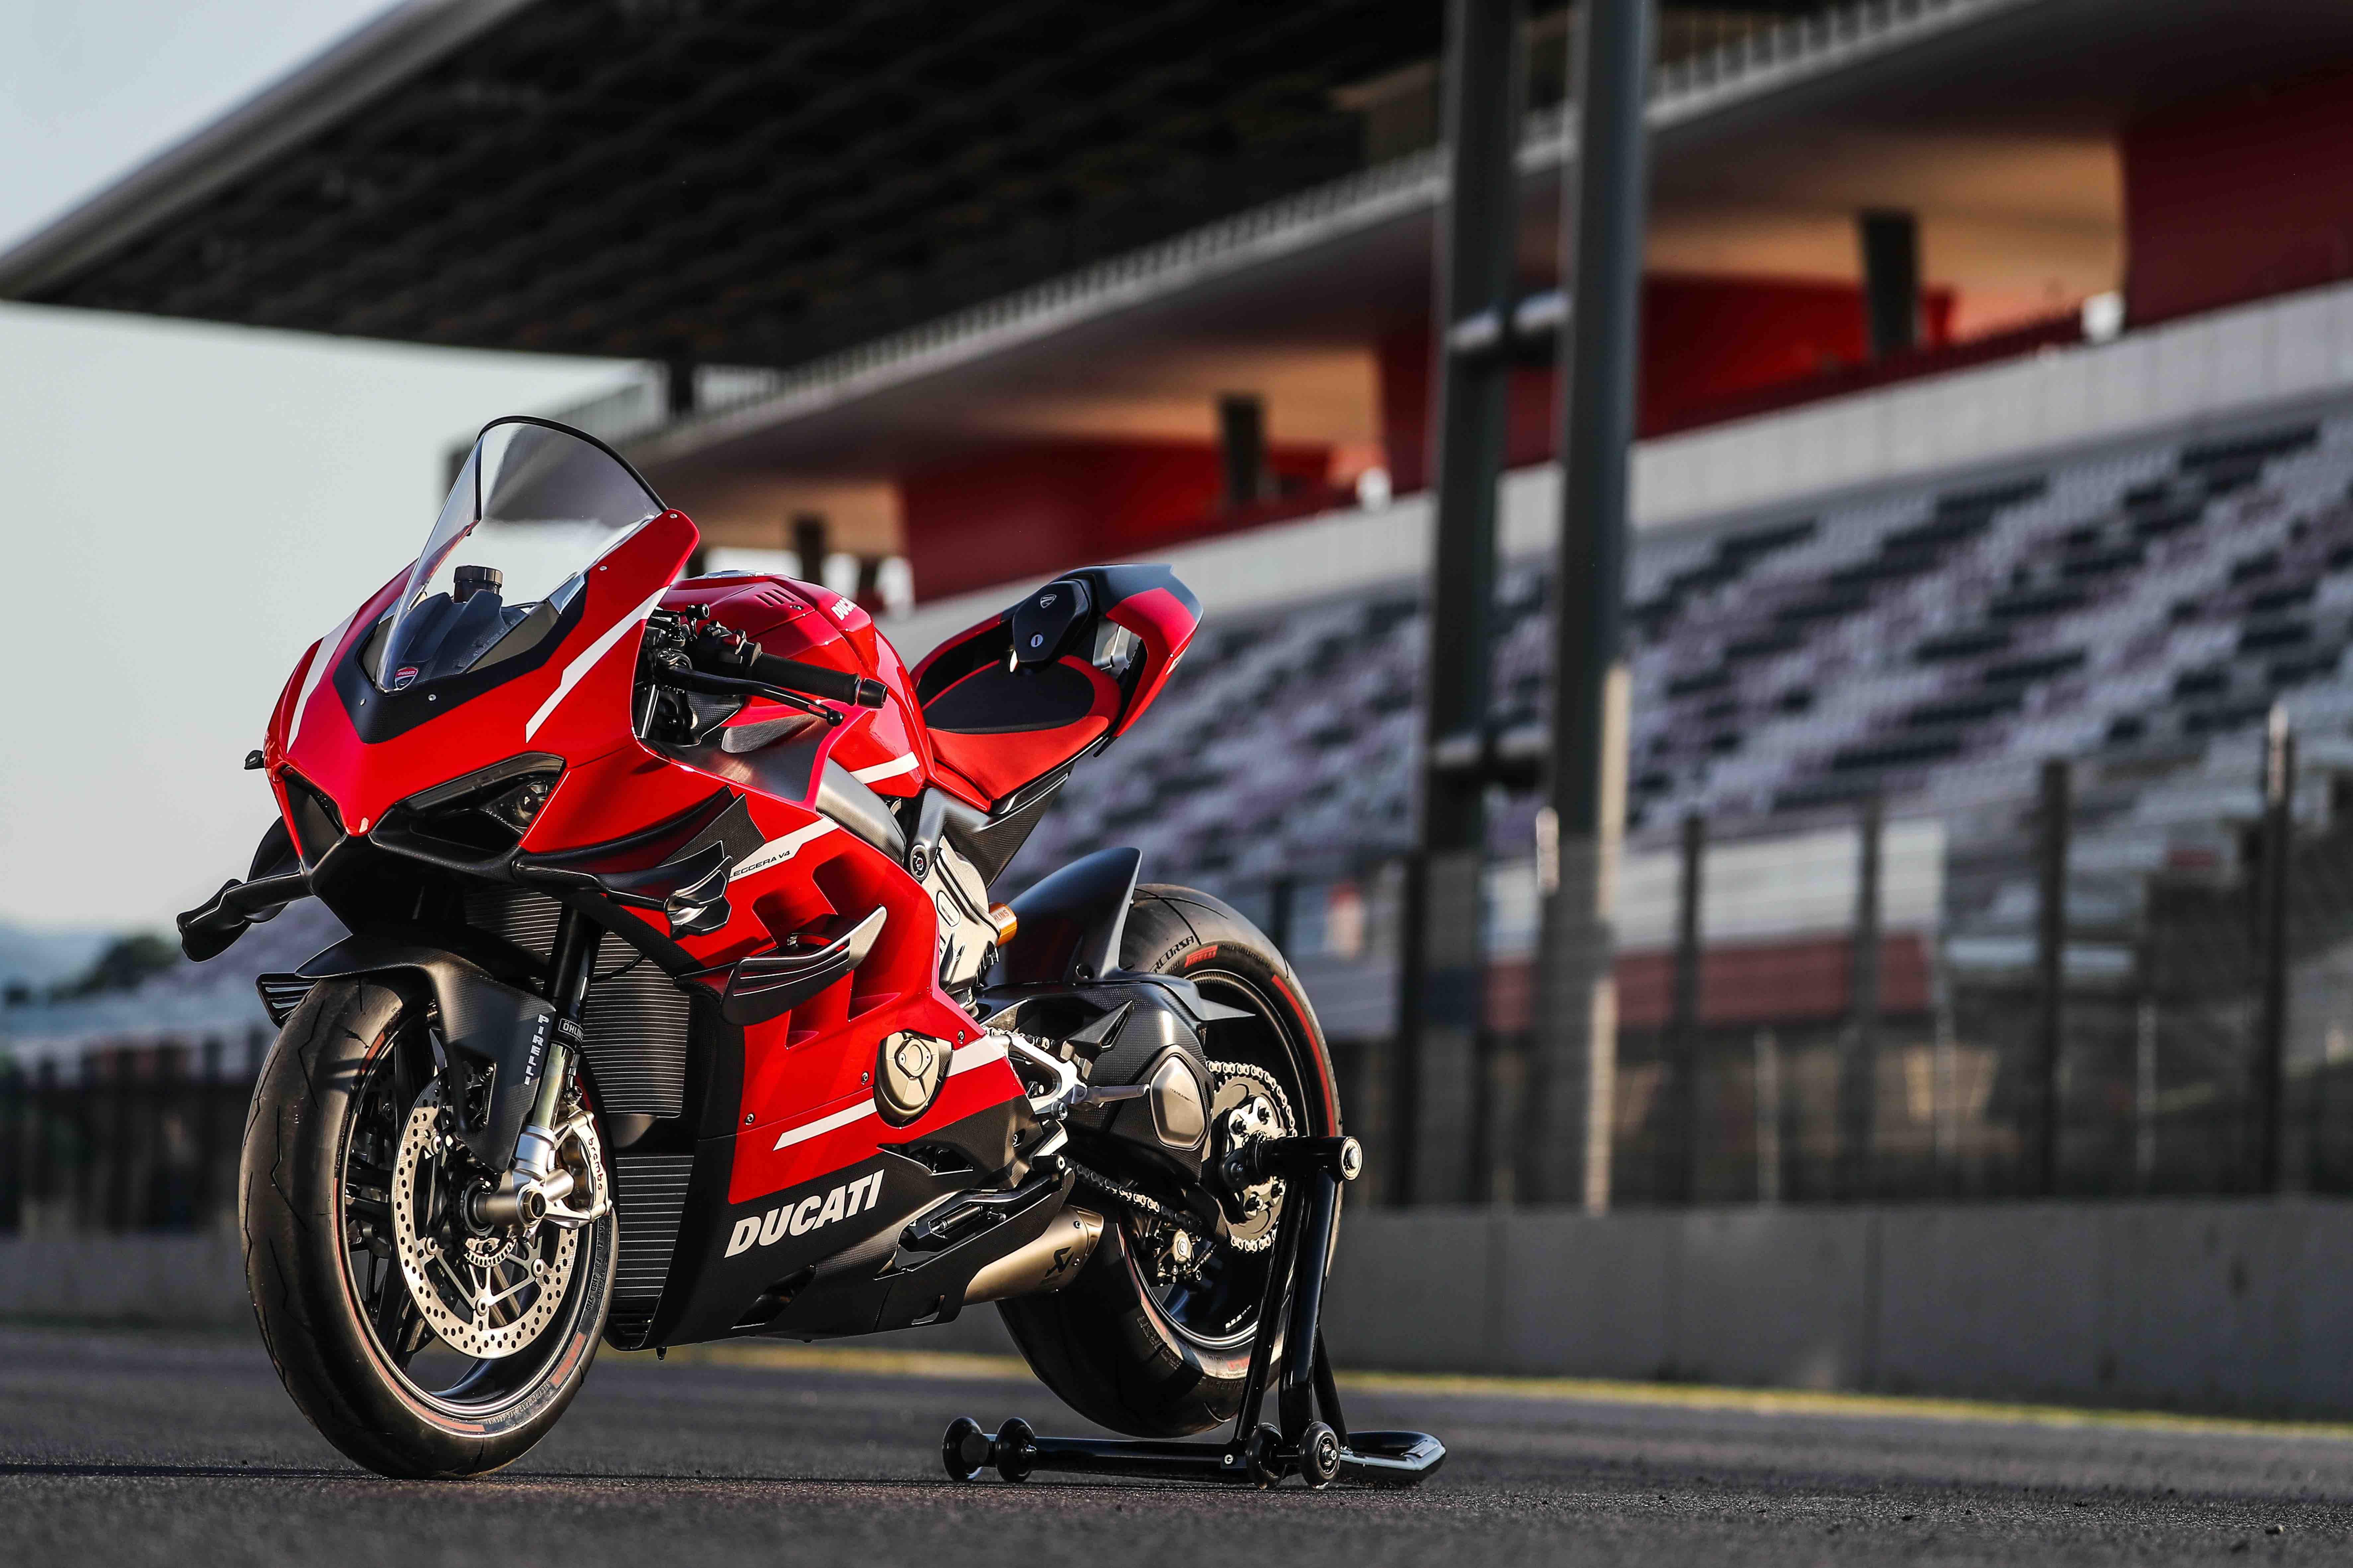 2020 Ducati Superleggera V4 8k, HD Bikes, 4k Wallpapers ...